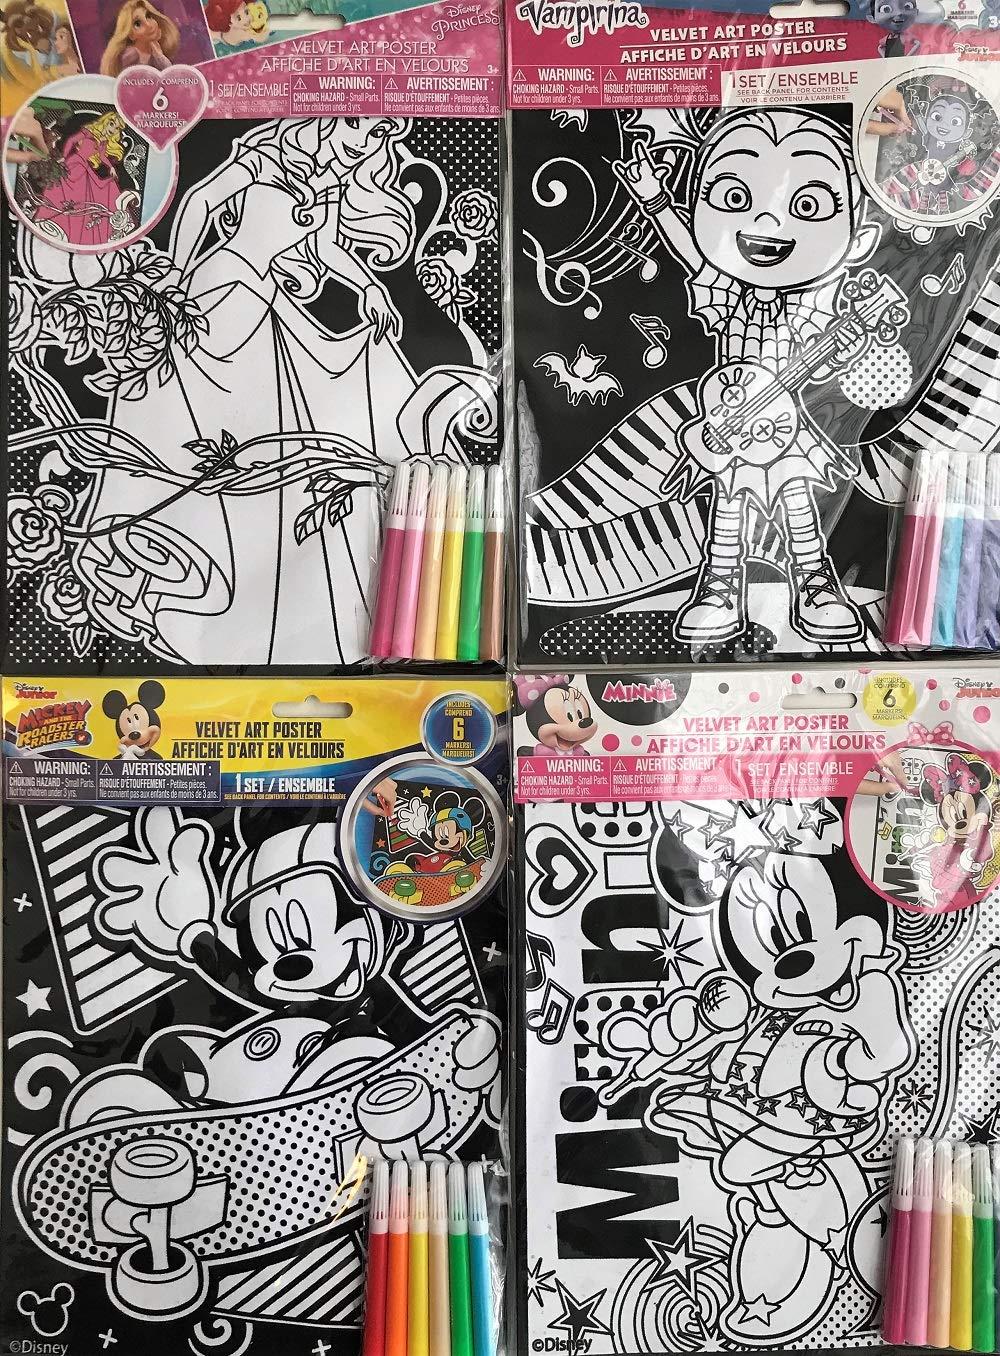 8-ct Set GBI Disney Cartoon Characters Velvet Poster Art Kits